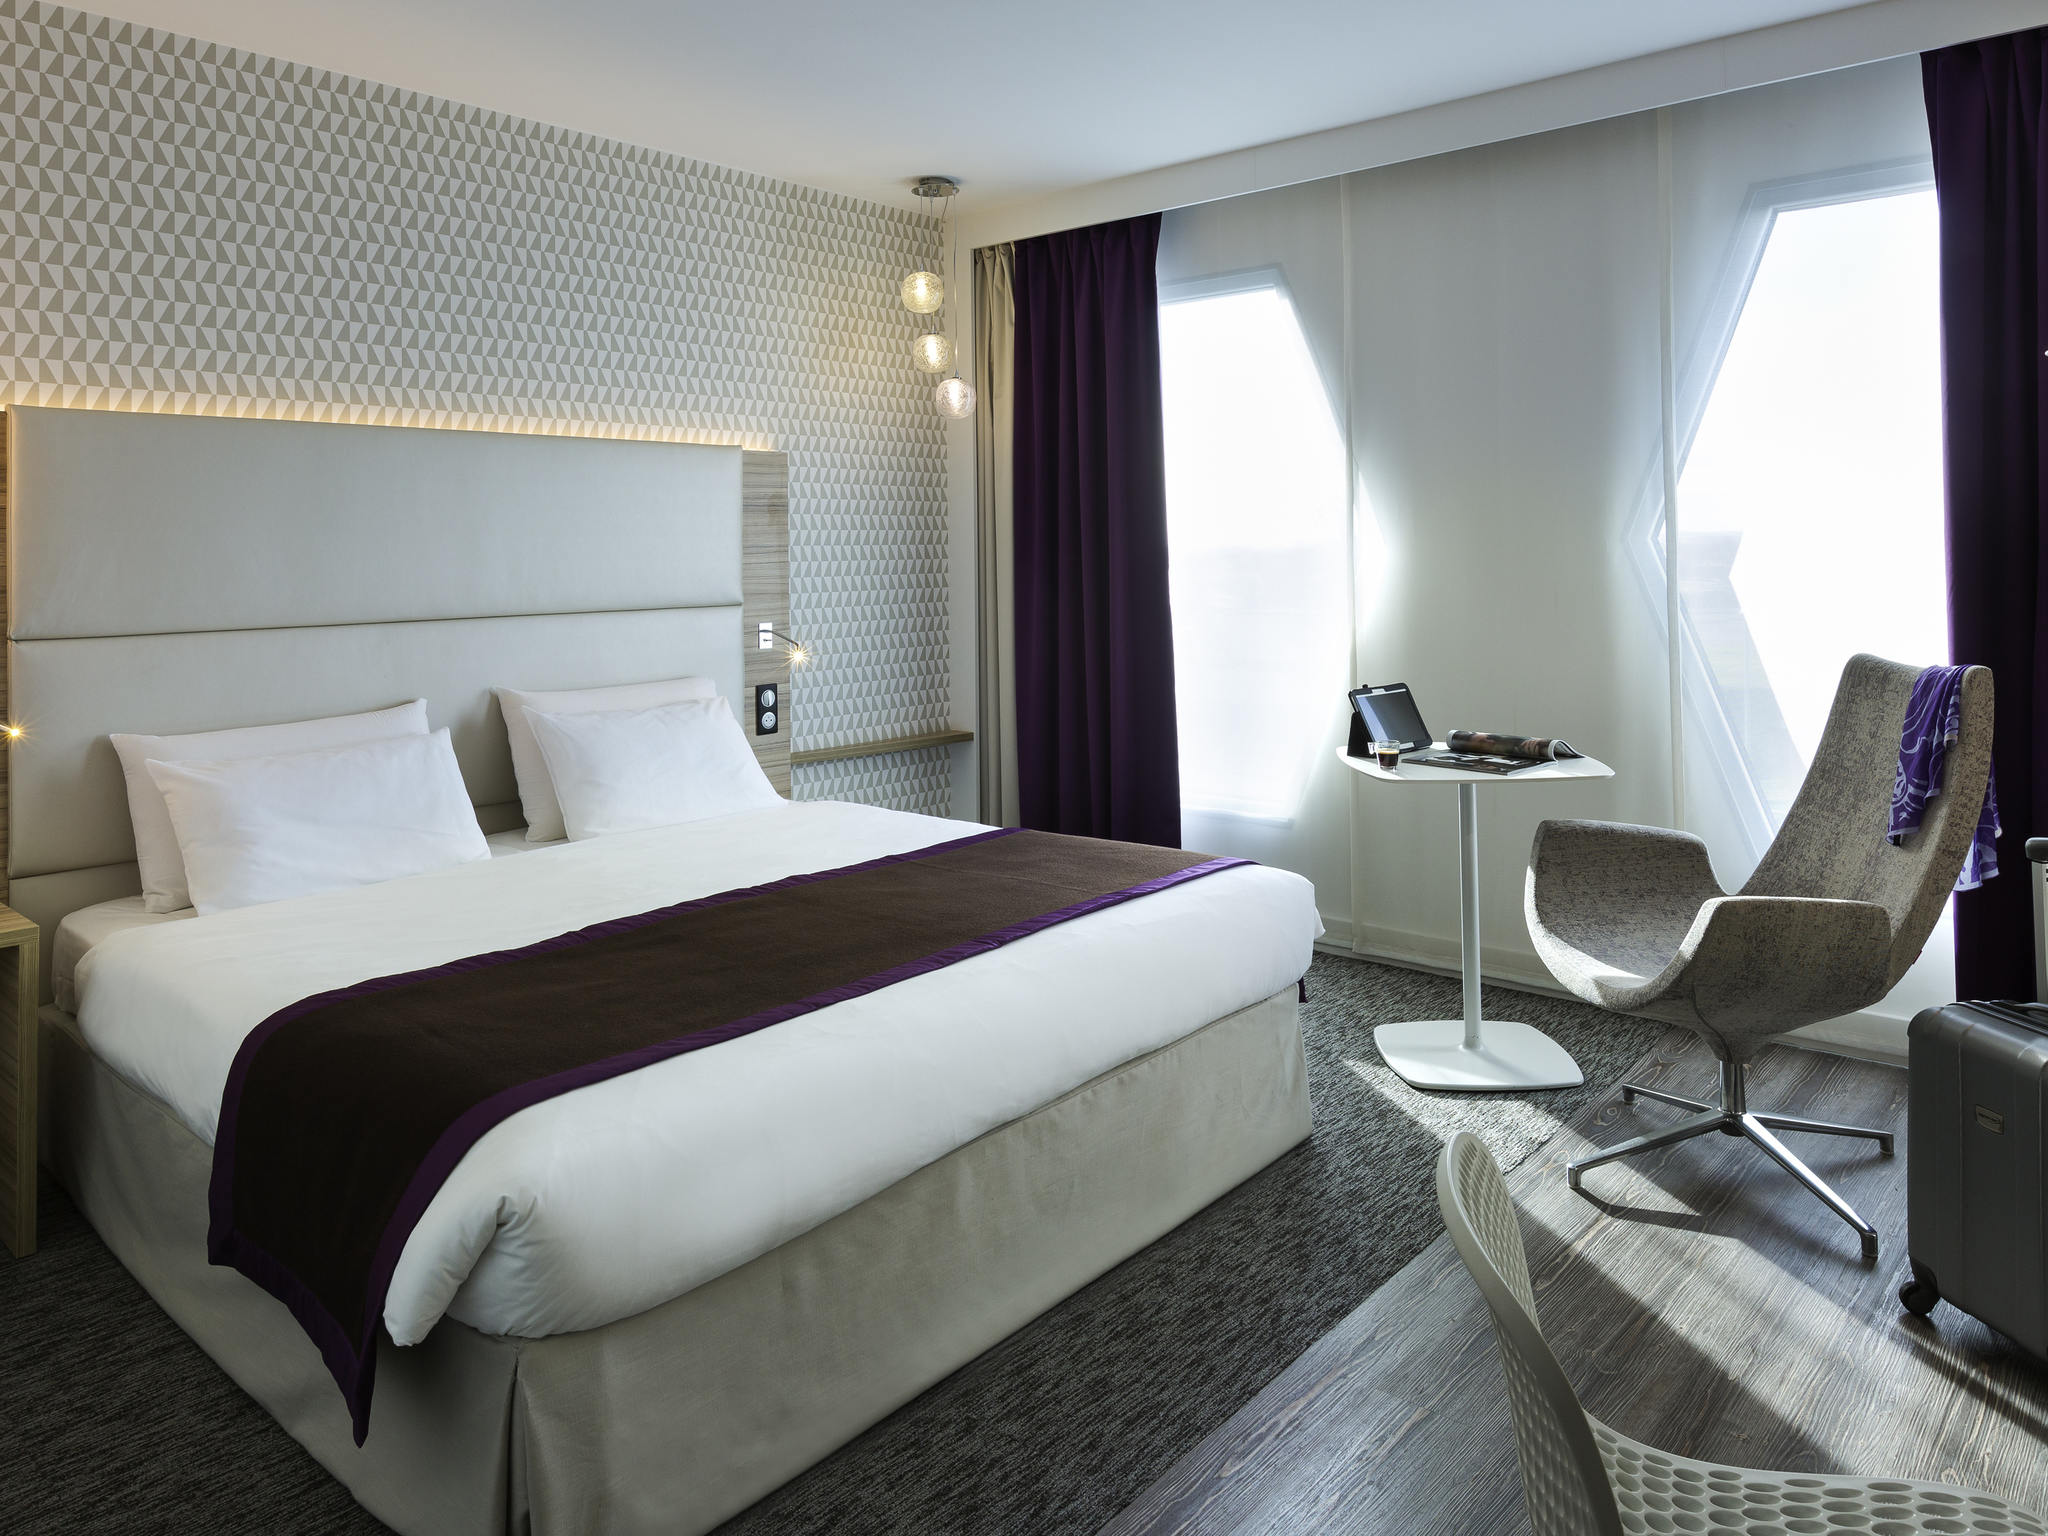 Hotel – Mercure Paris Orly Rungis Aéroport Hotel